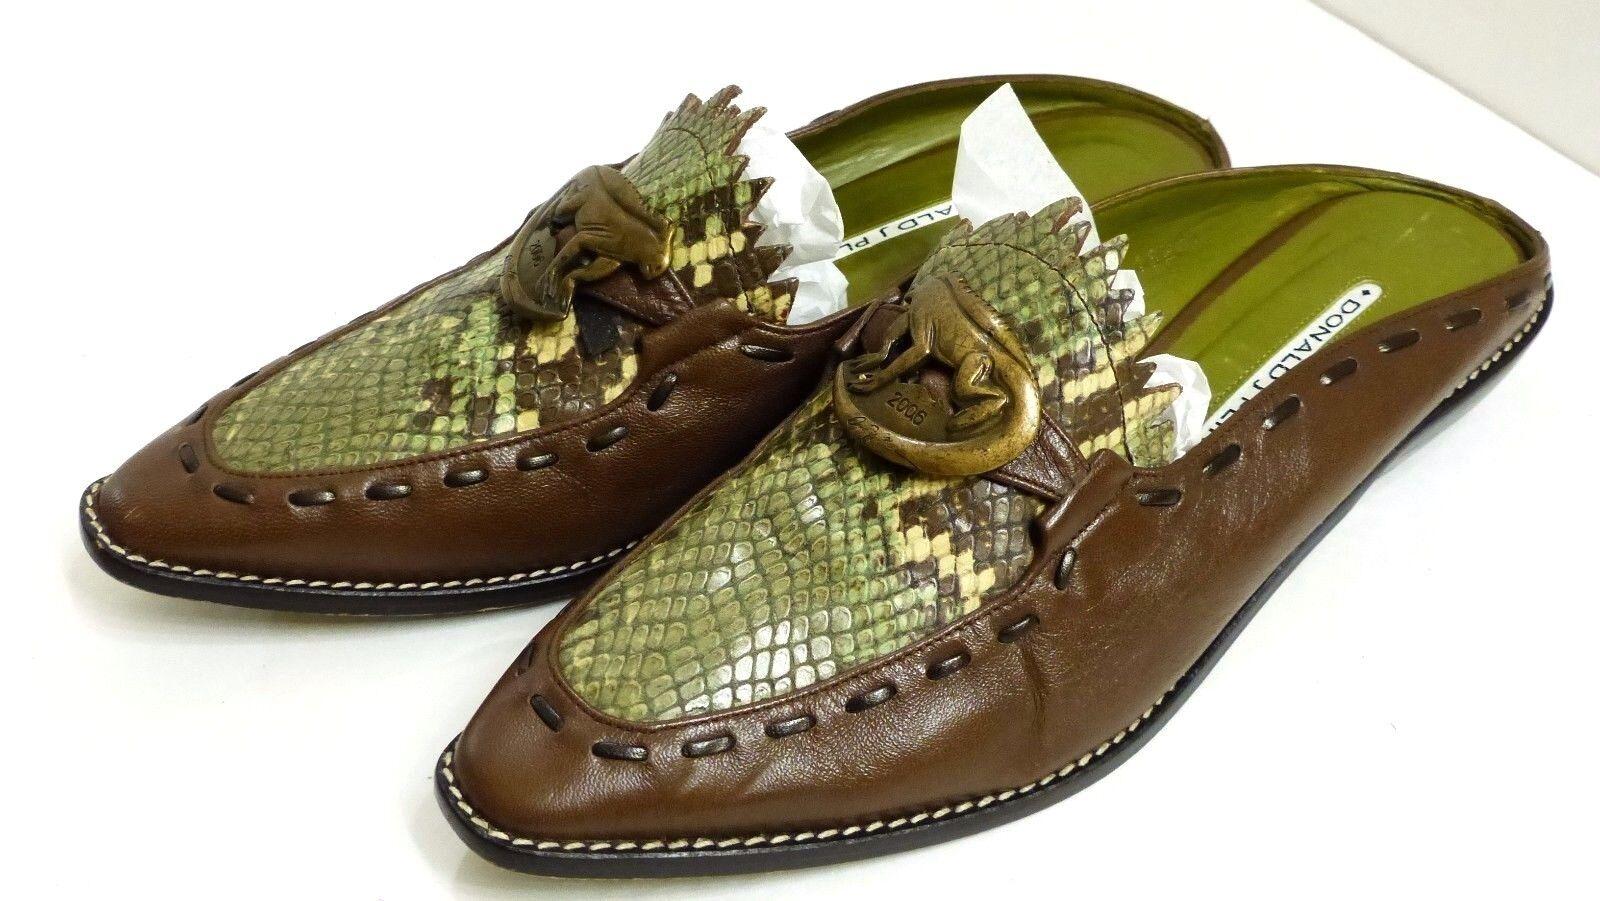 EUC Donald J. Pliner Iguana S1 Women's 6 1 2 M Brown Green Leather Mules